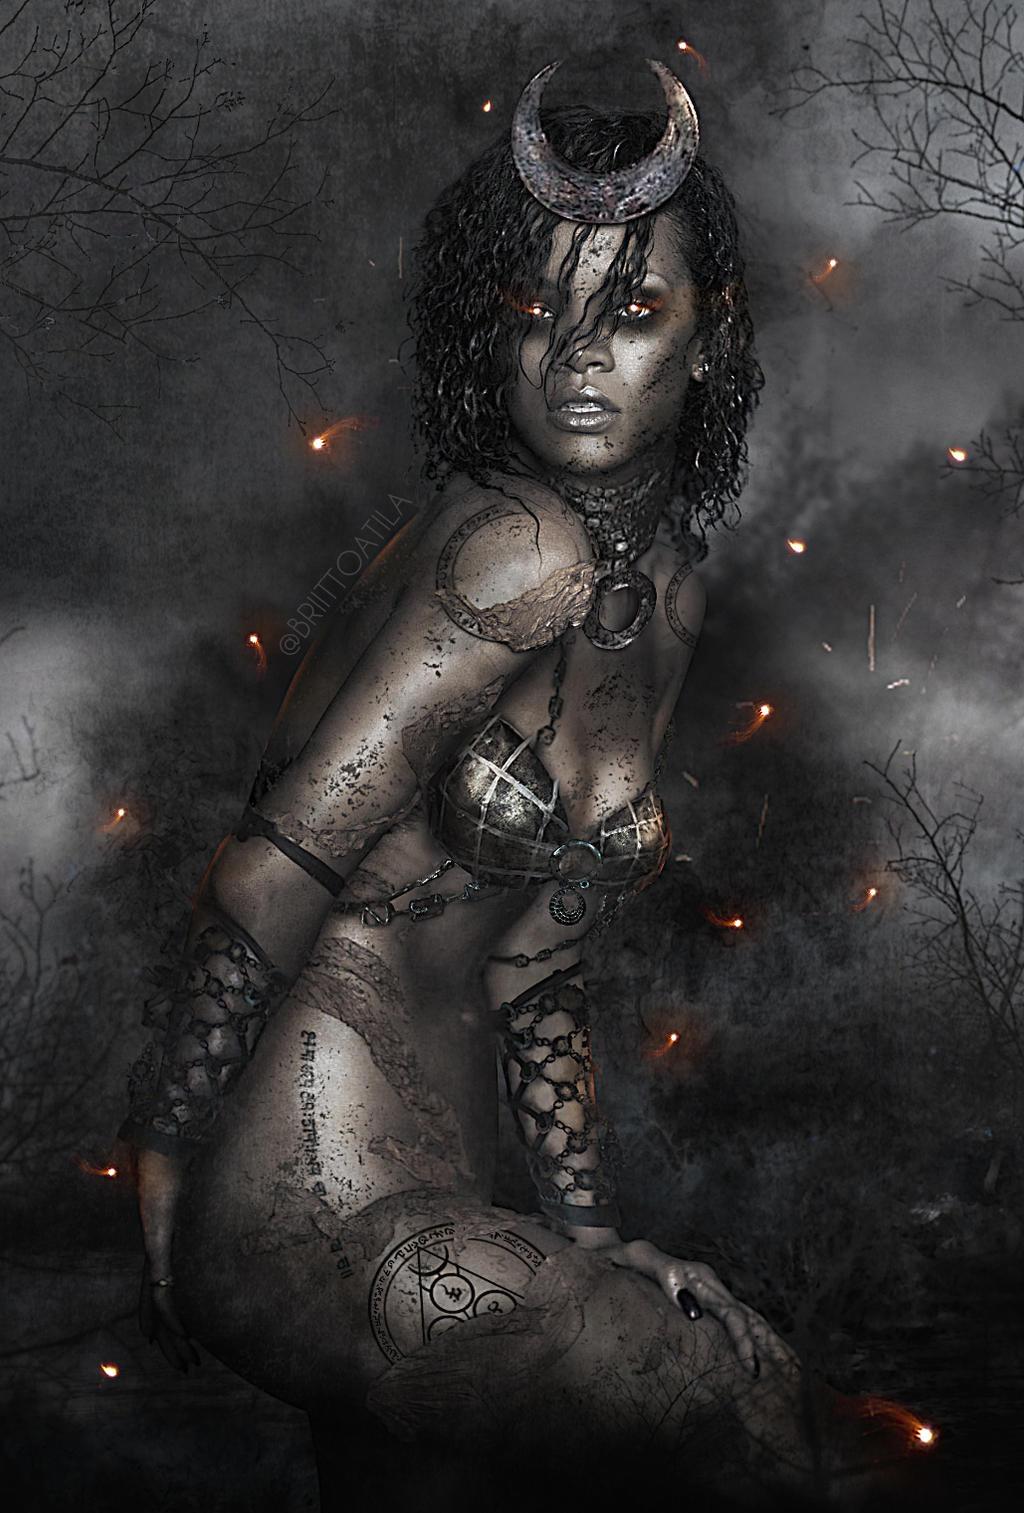 - EnchantRIHss - by brittoatila